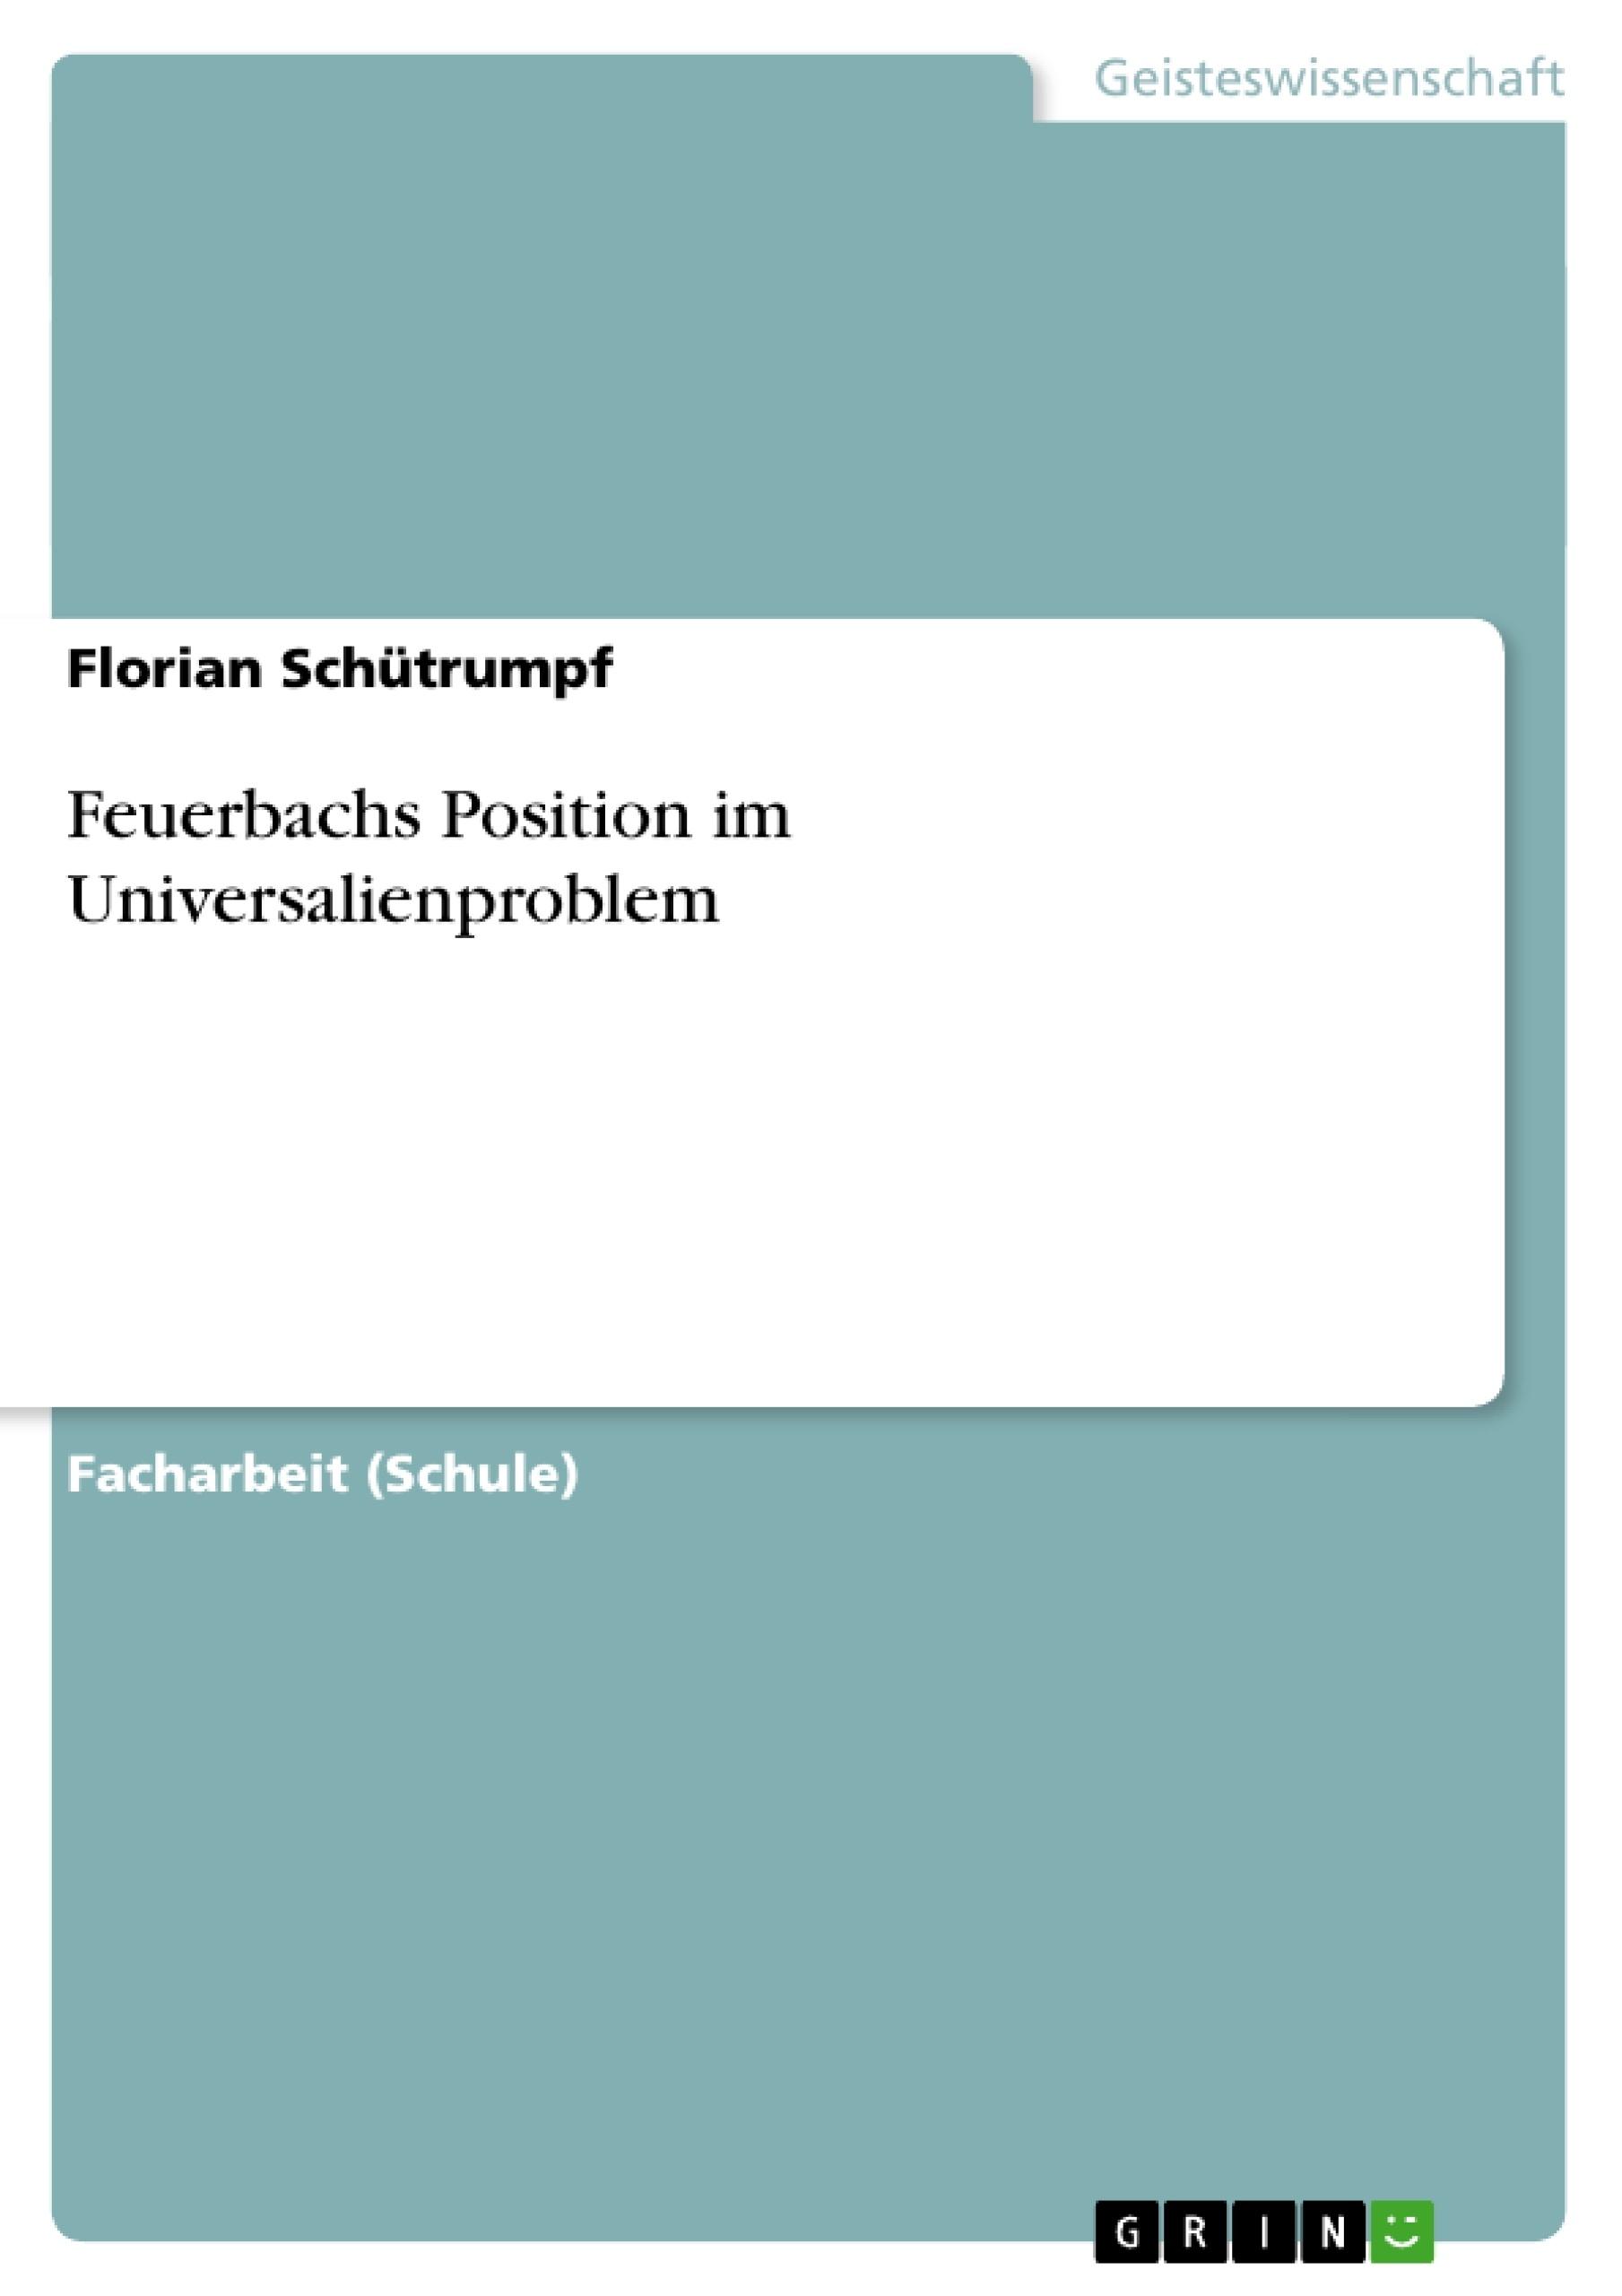 Titel: Feuerbachs Position im Universalienproblem